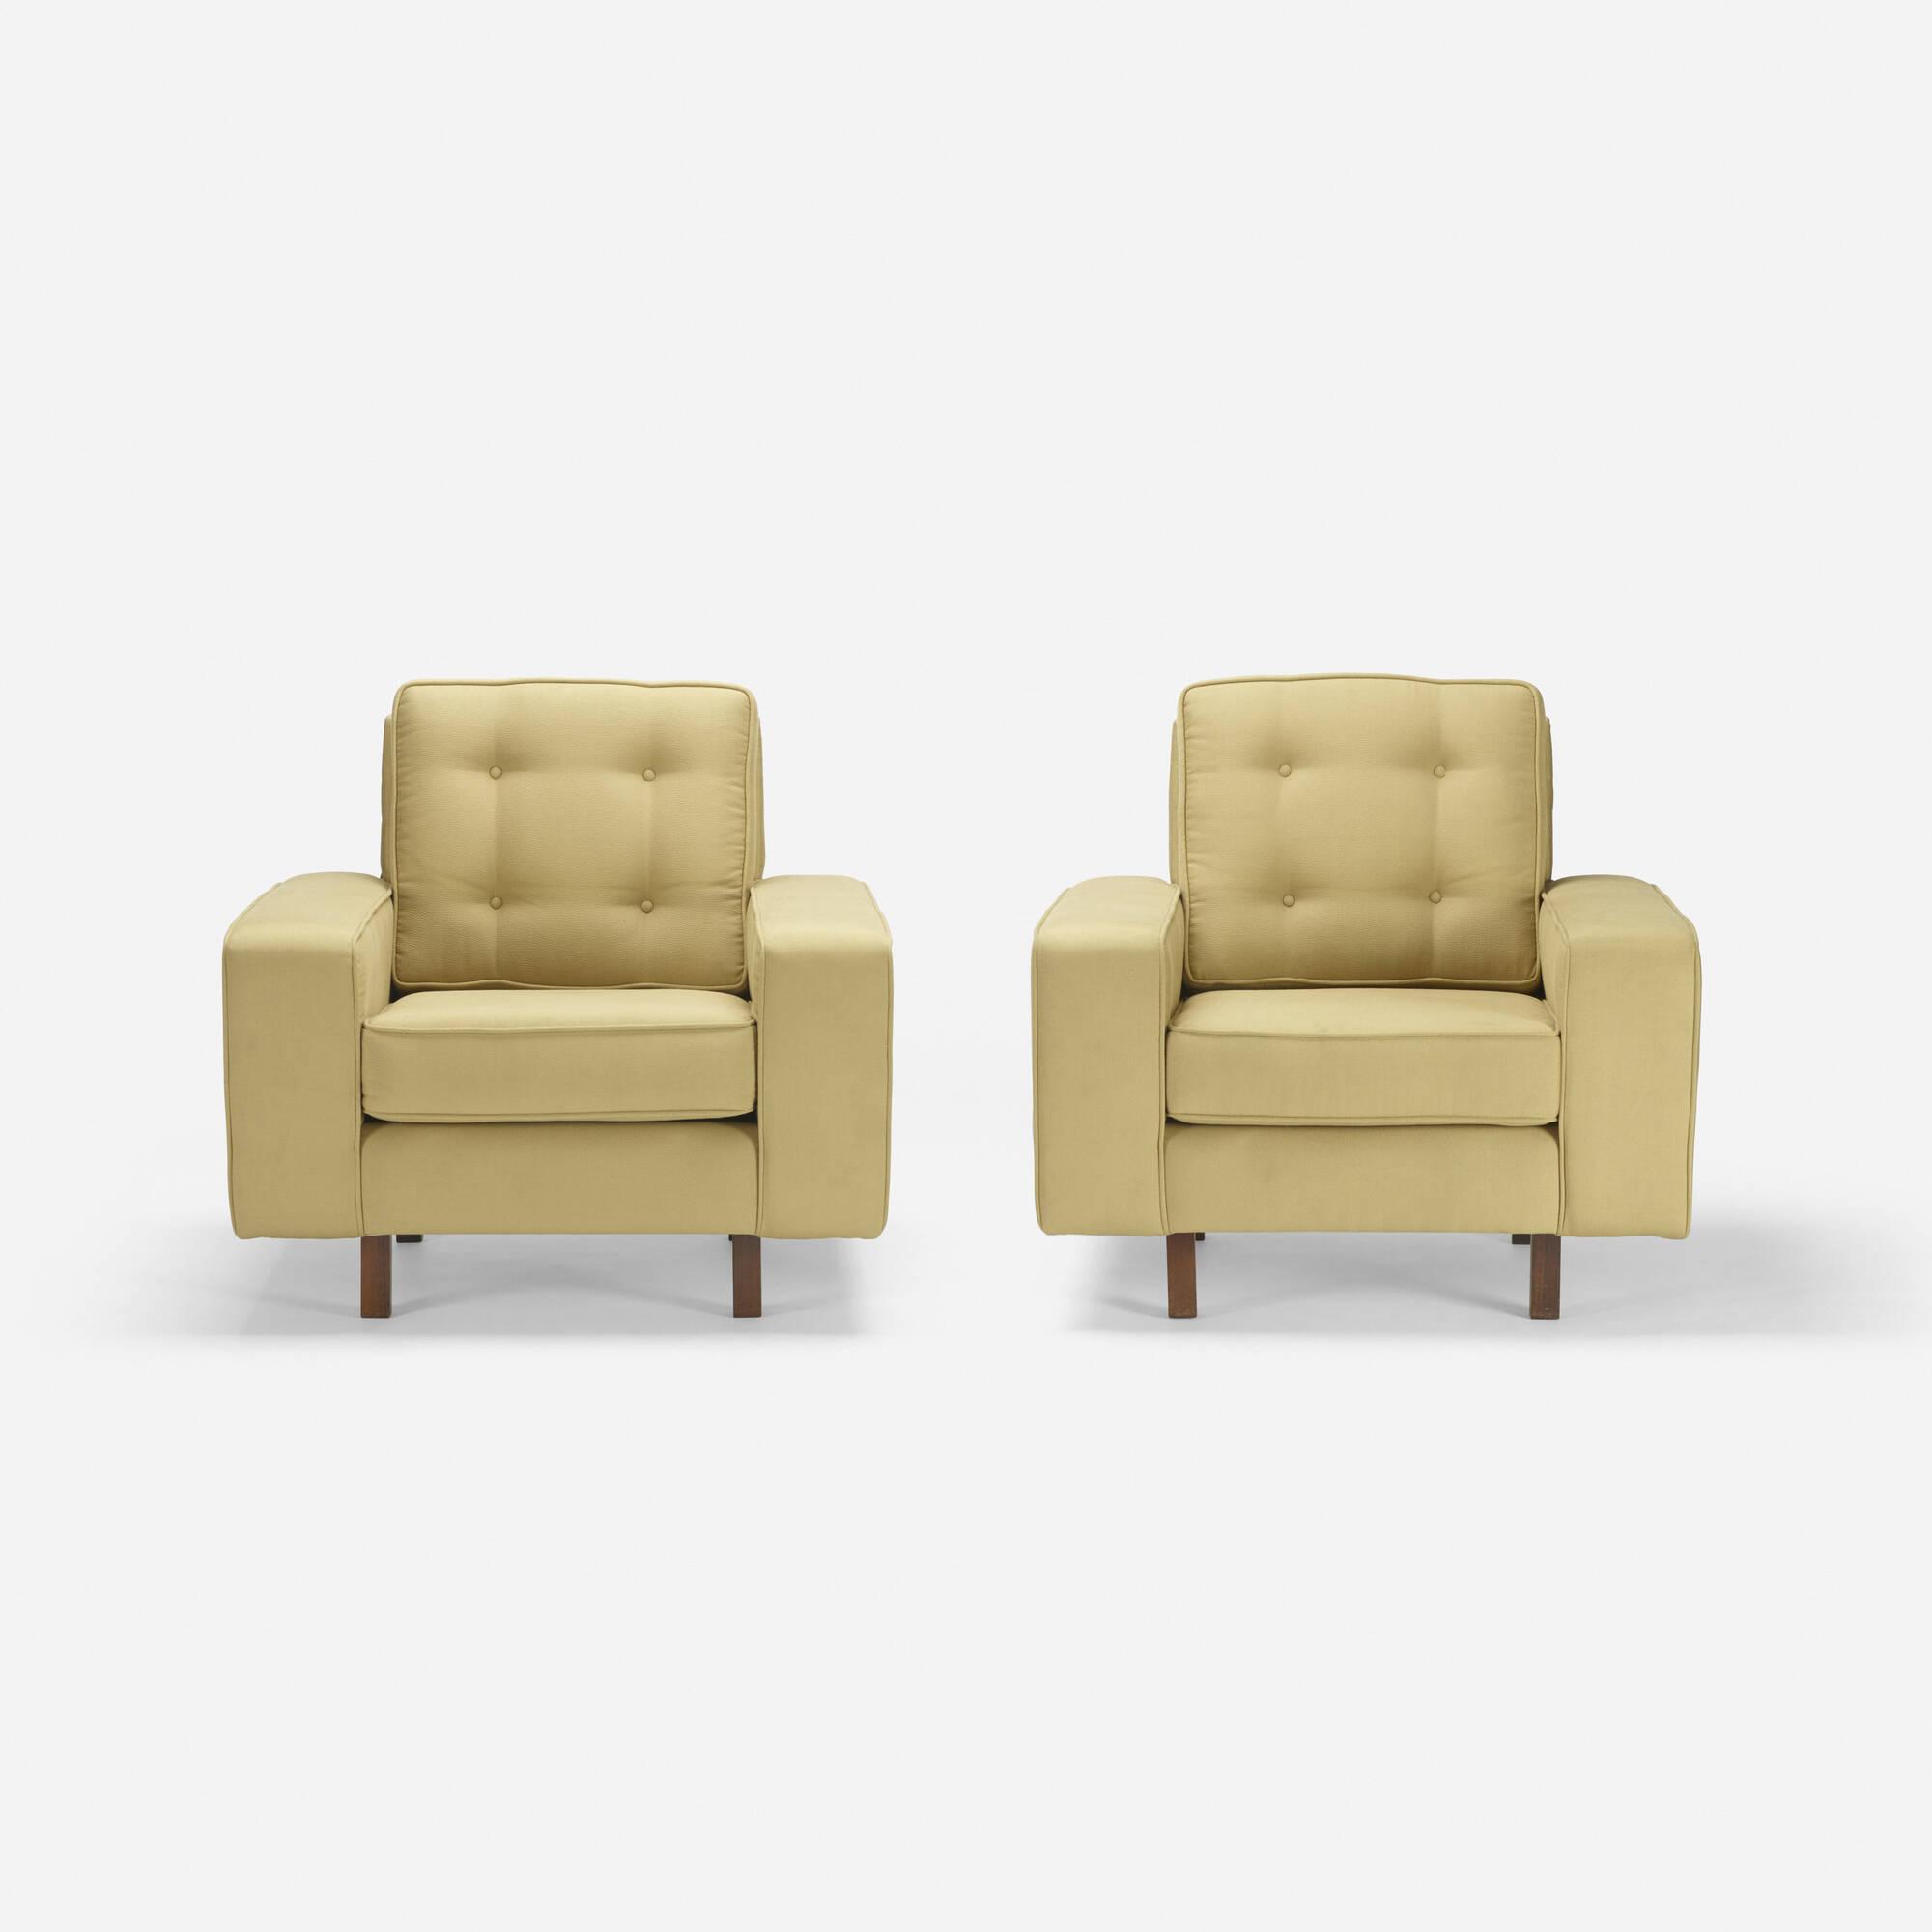 183: Joaquim Tenreiro / lounge chairs, pair (2 of 3)